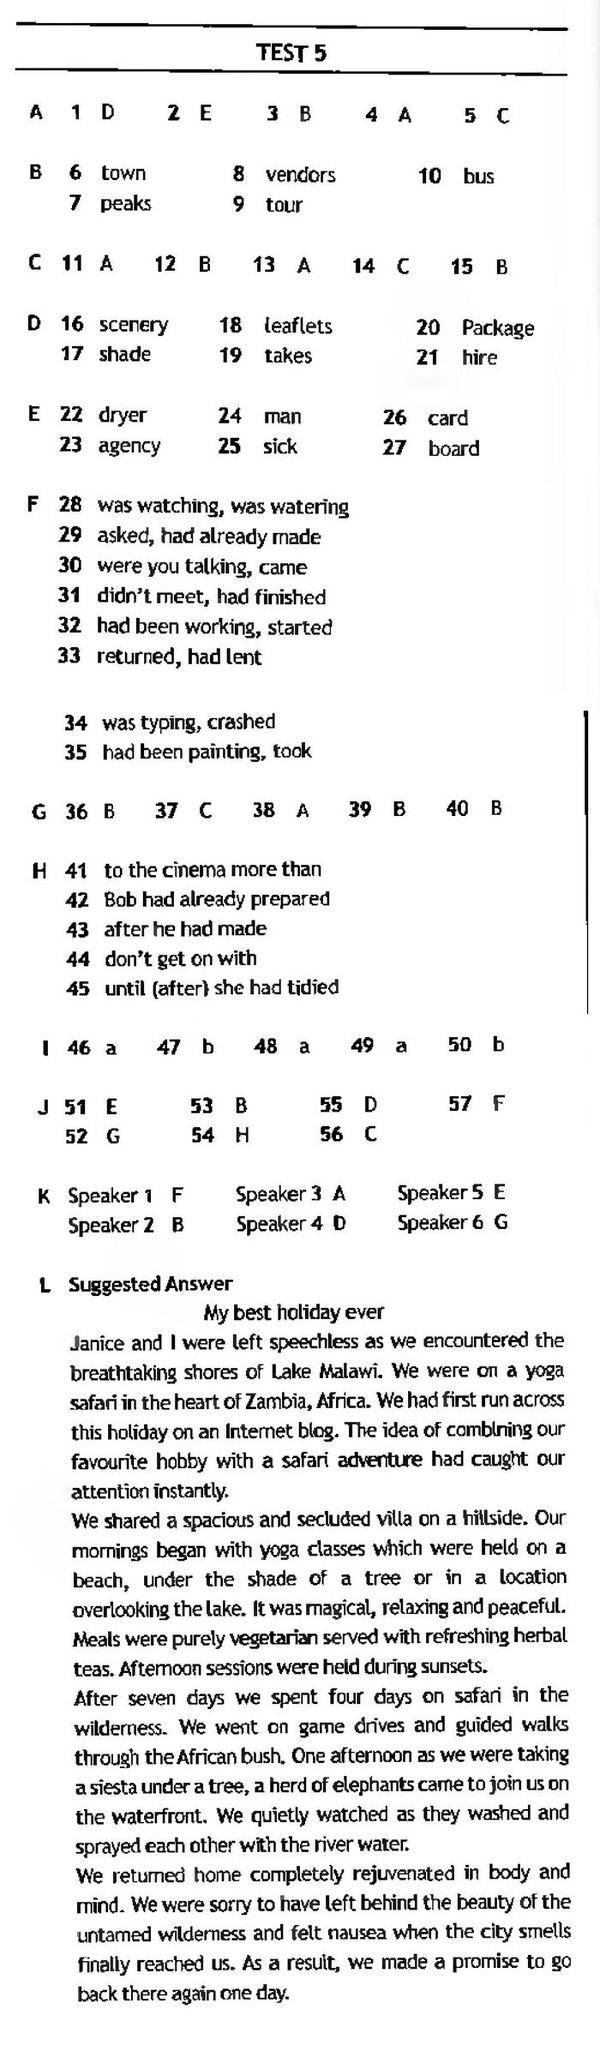 Гдз английский 7 класс ваулина учебник 2017